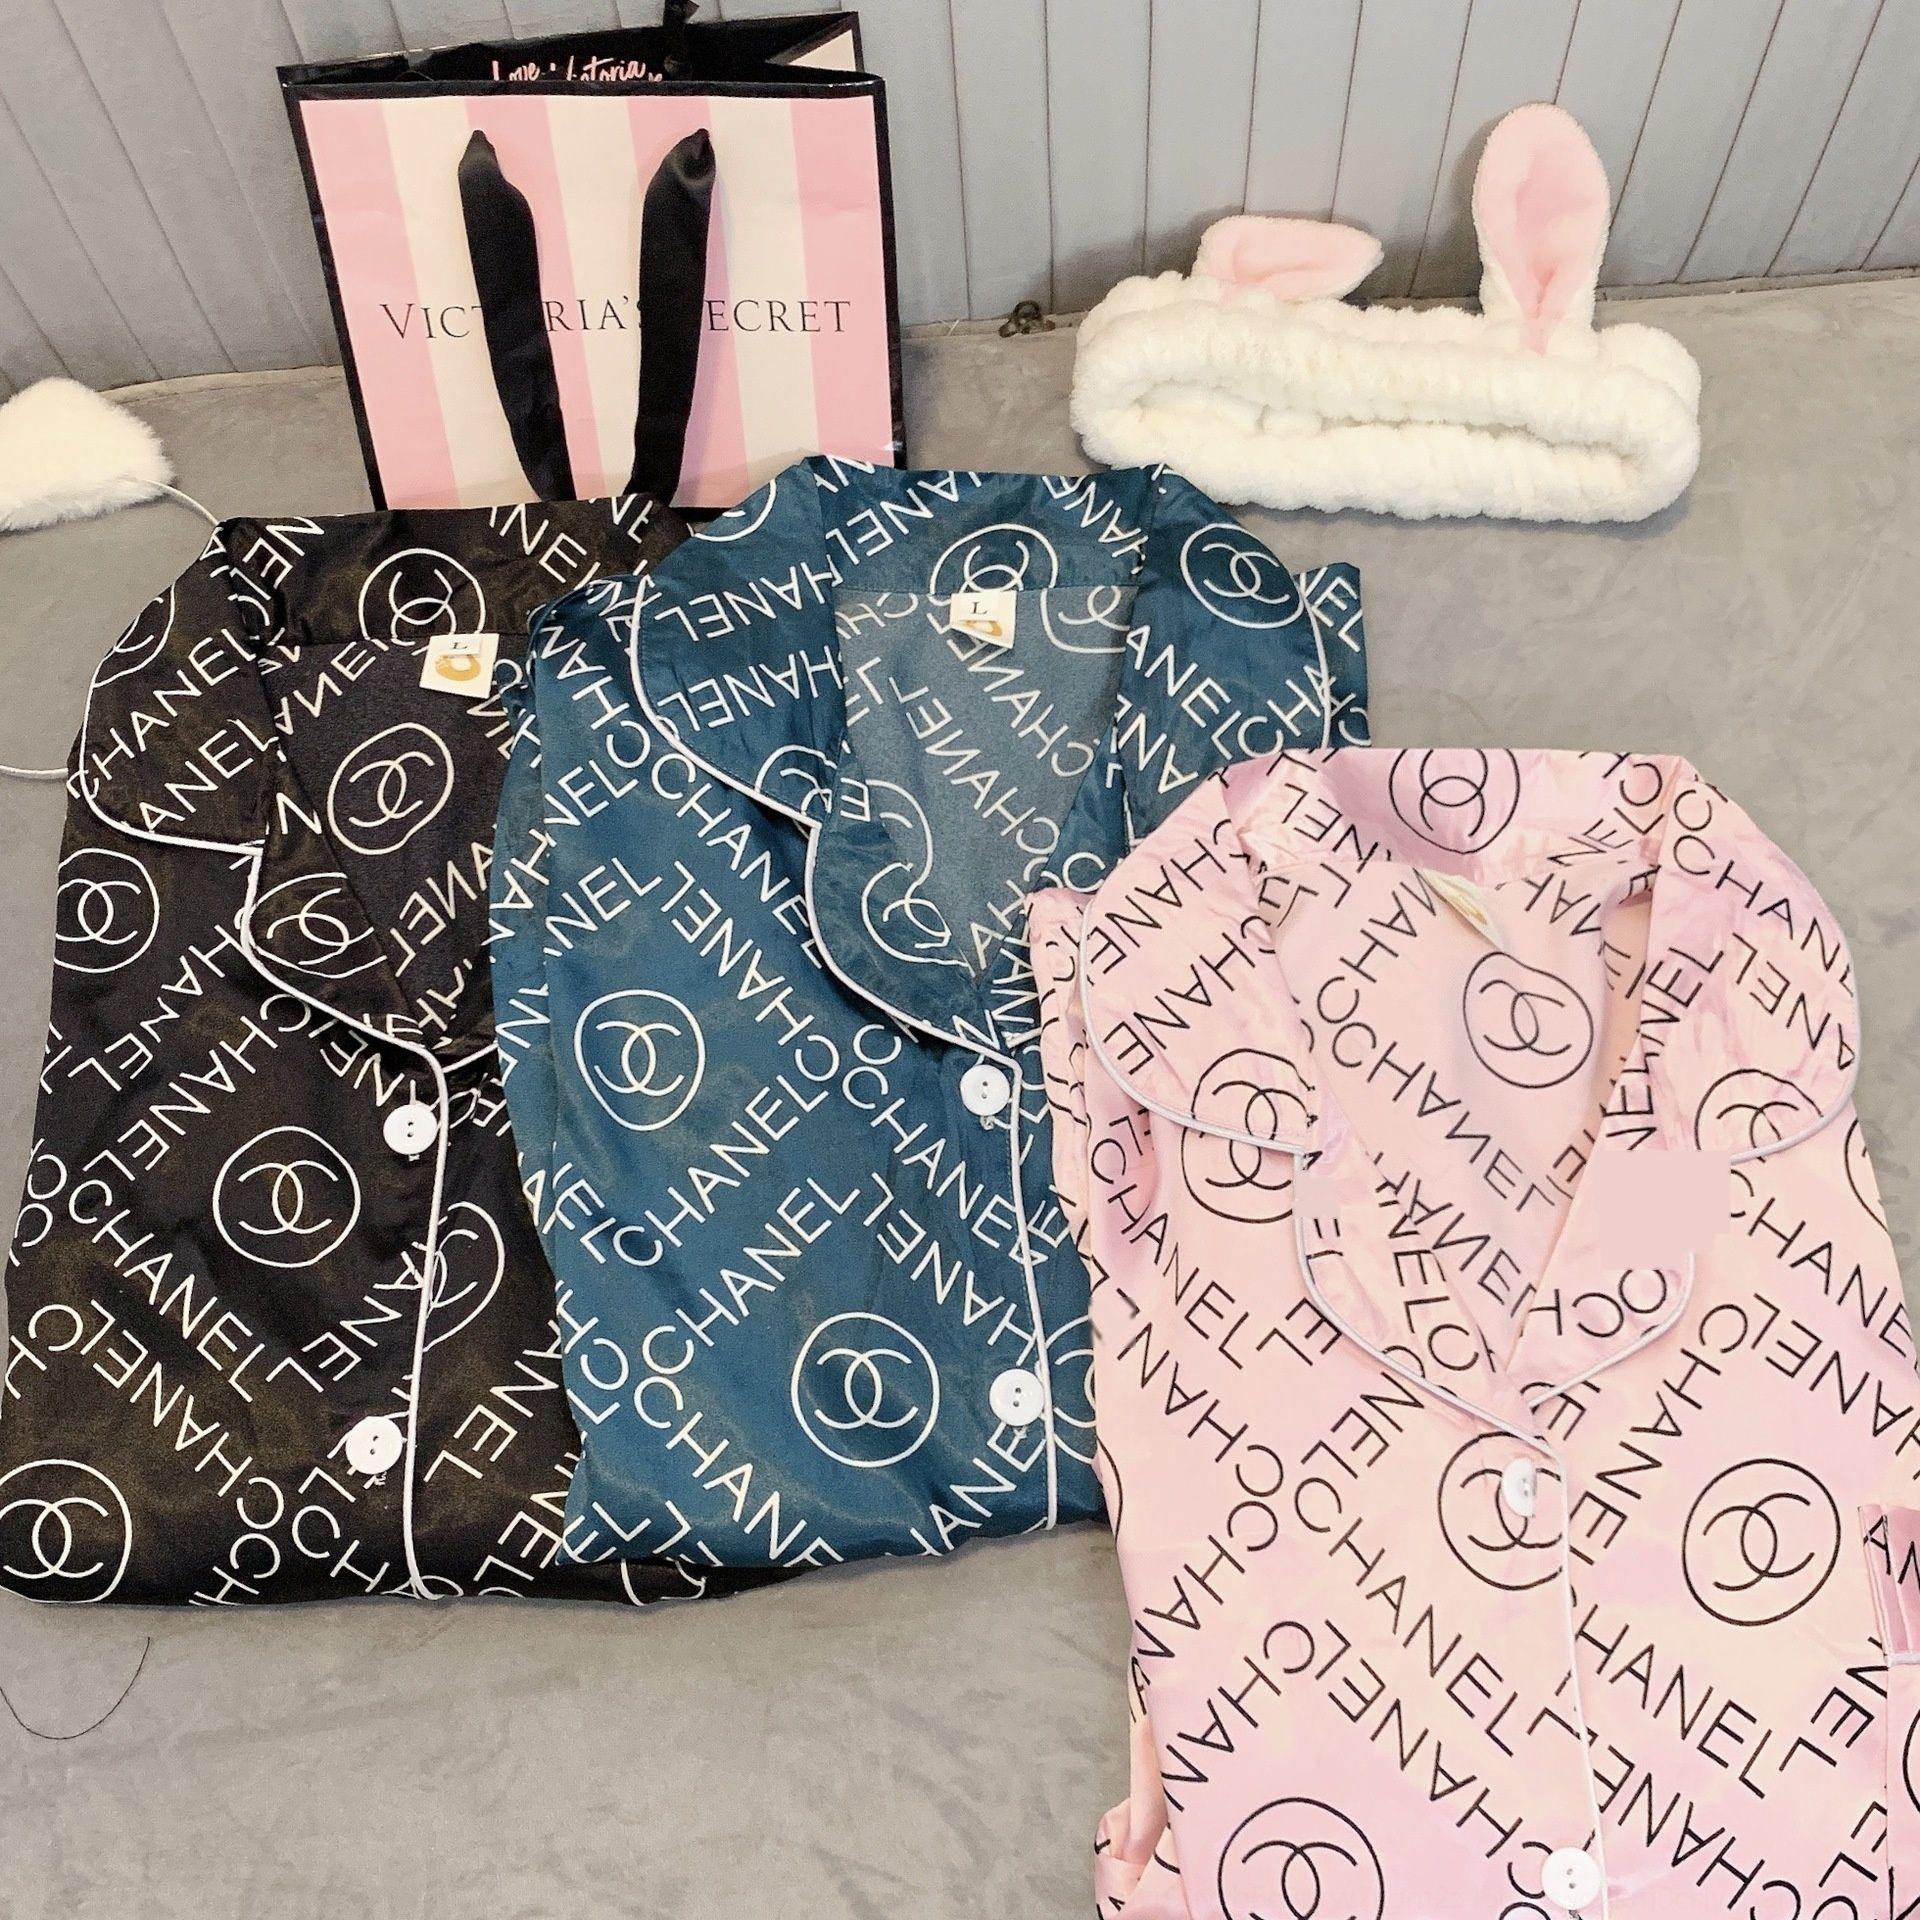 qVEj Womens Pajamas Sets Y200425 Short-Sleeve Shirts And Pants Animal Print Pajama Set Sleepwear Women Sexy Summer Homewear 100Cotton